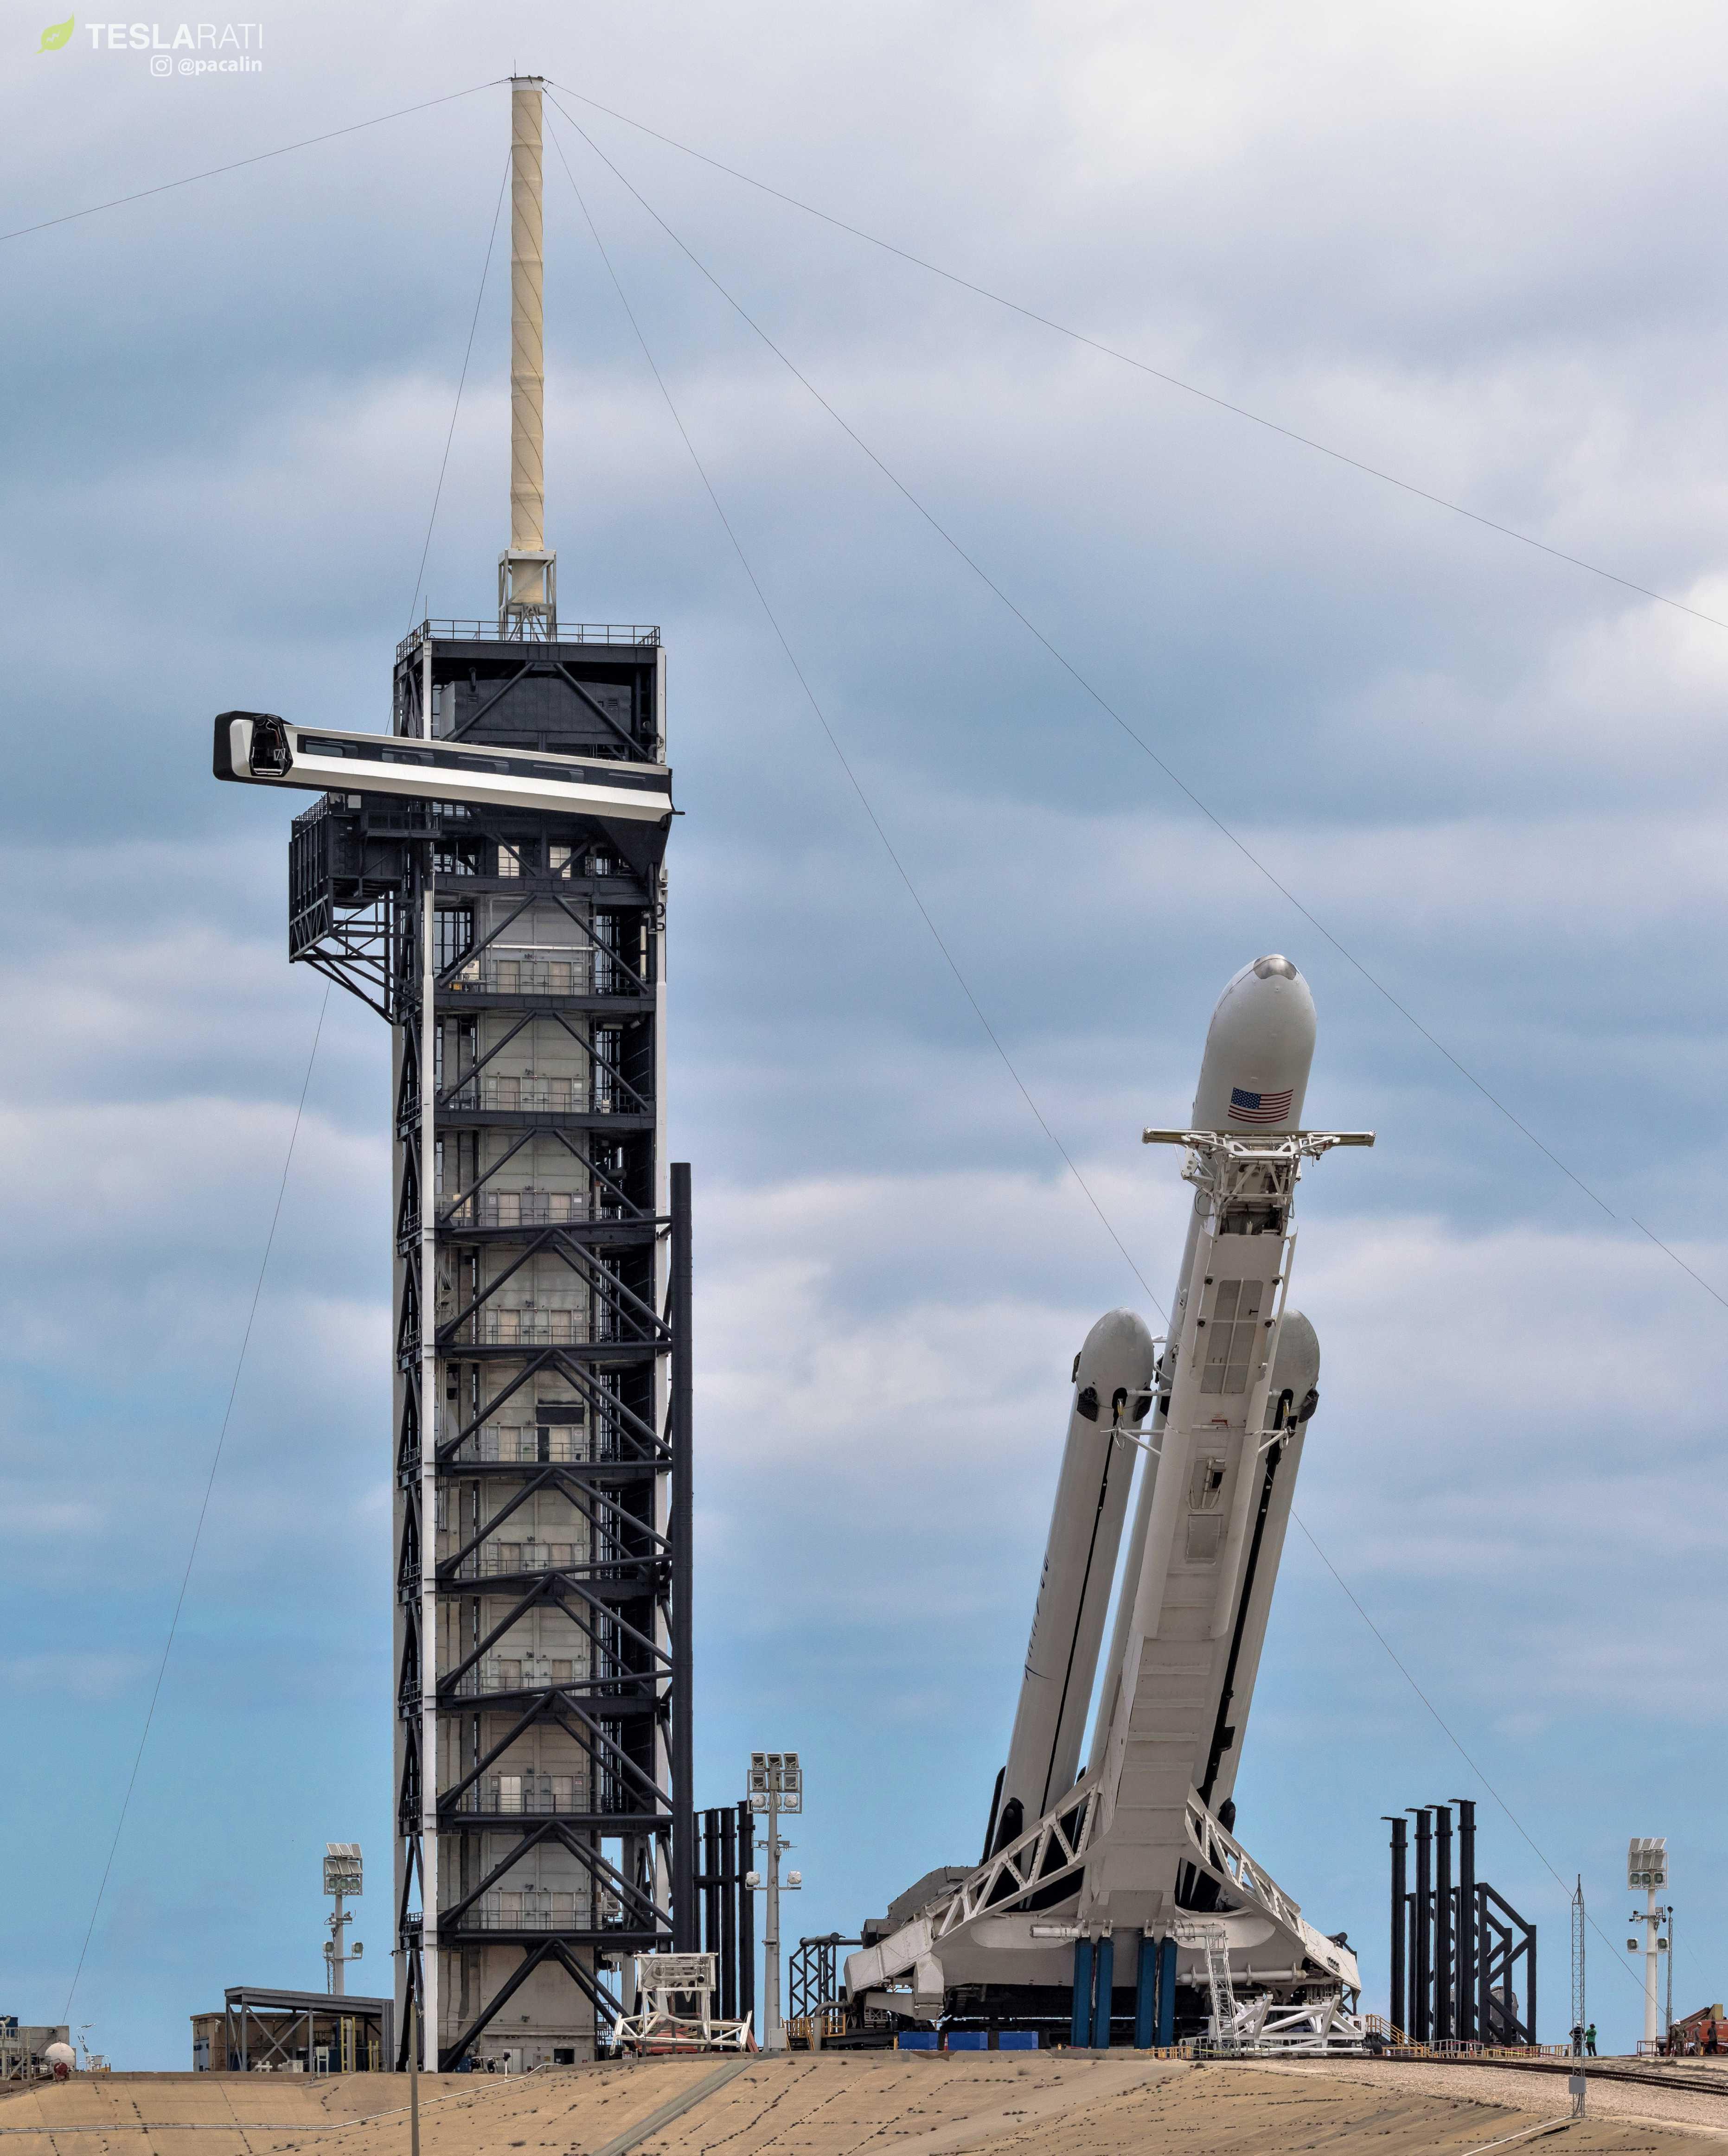 Falcon Heavy Flight 2 prelaunch 39A (Pauline Acalin) (7) edit (c)